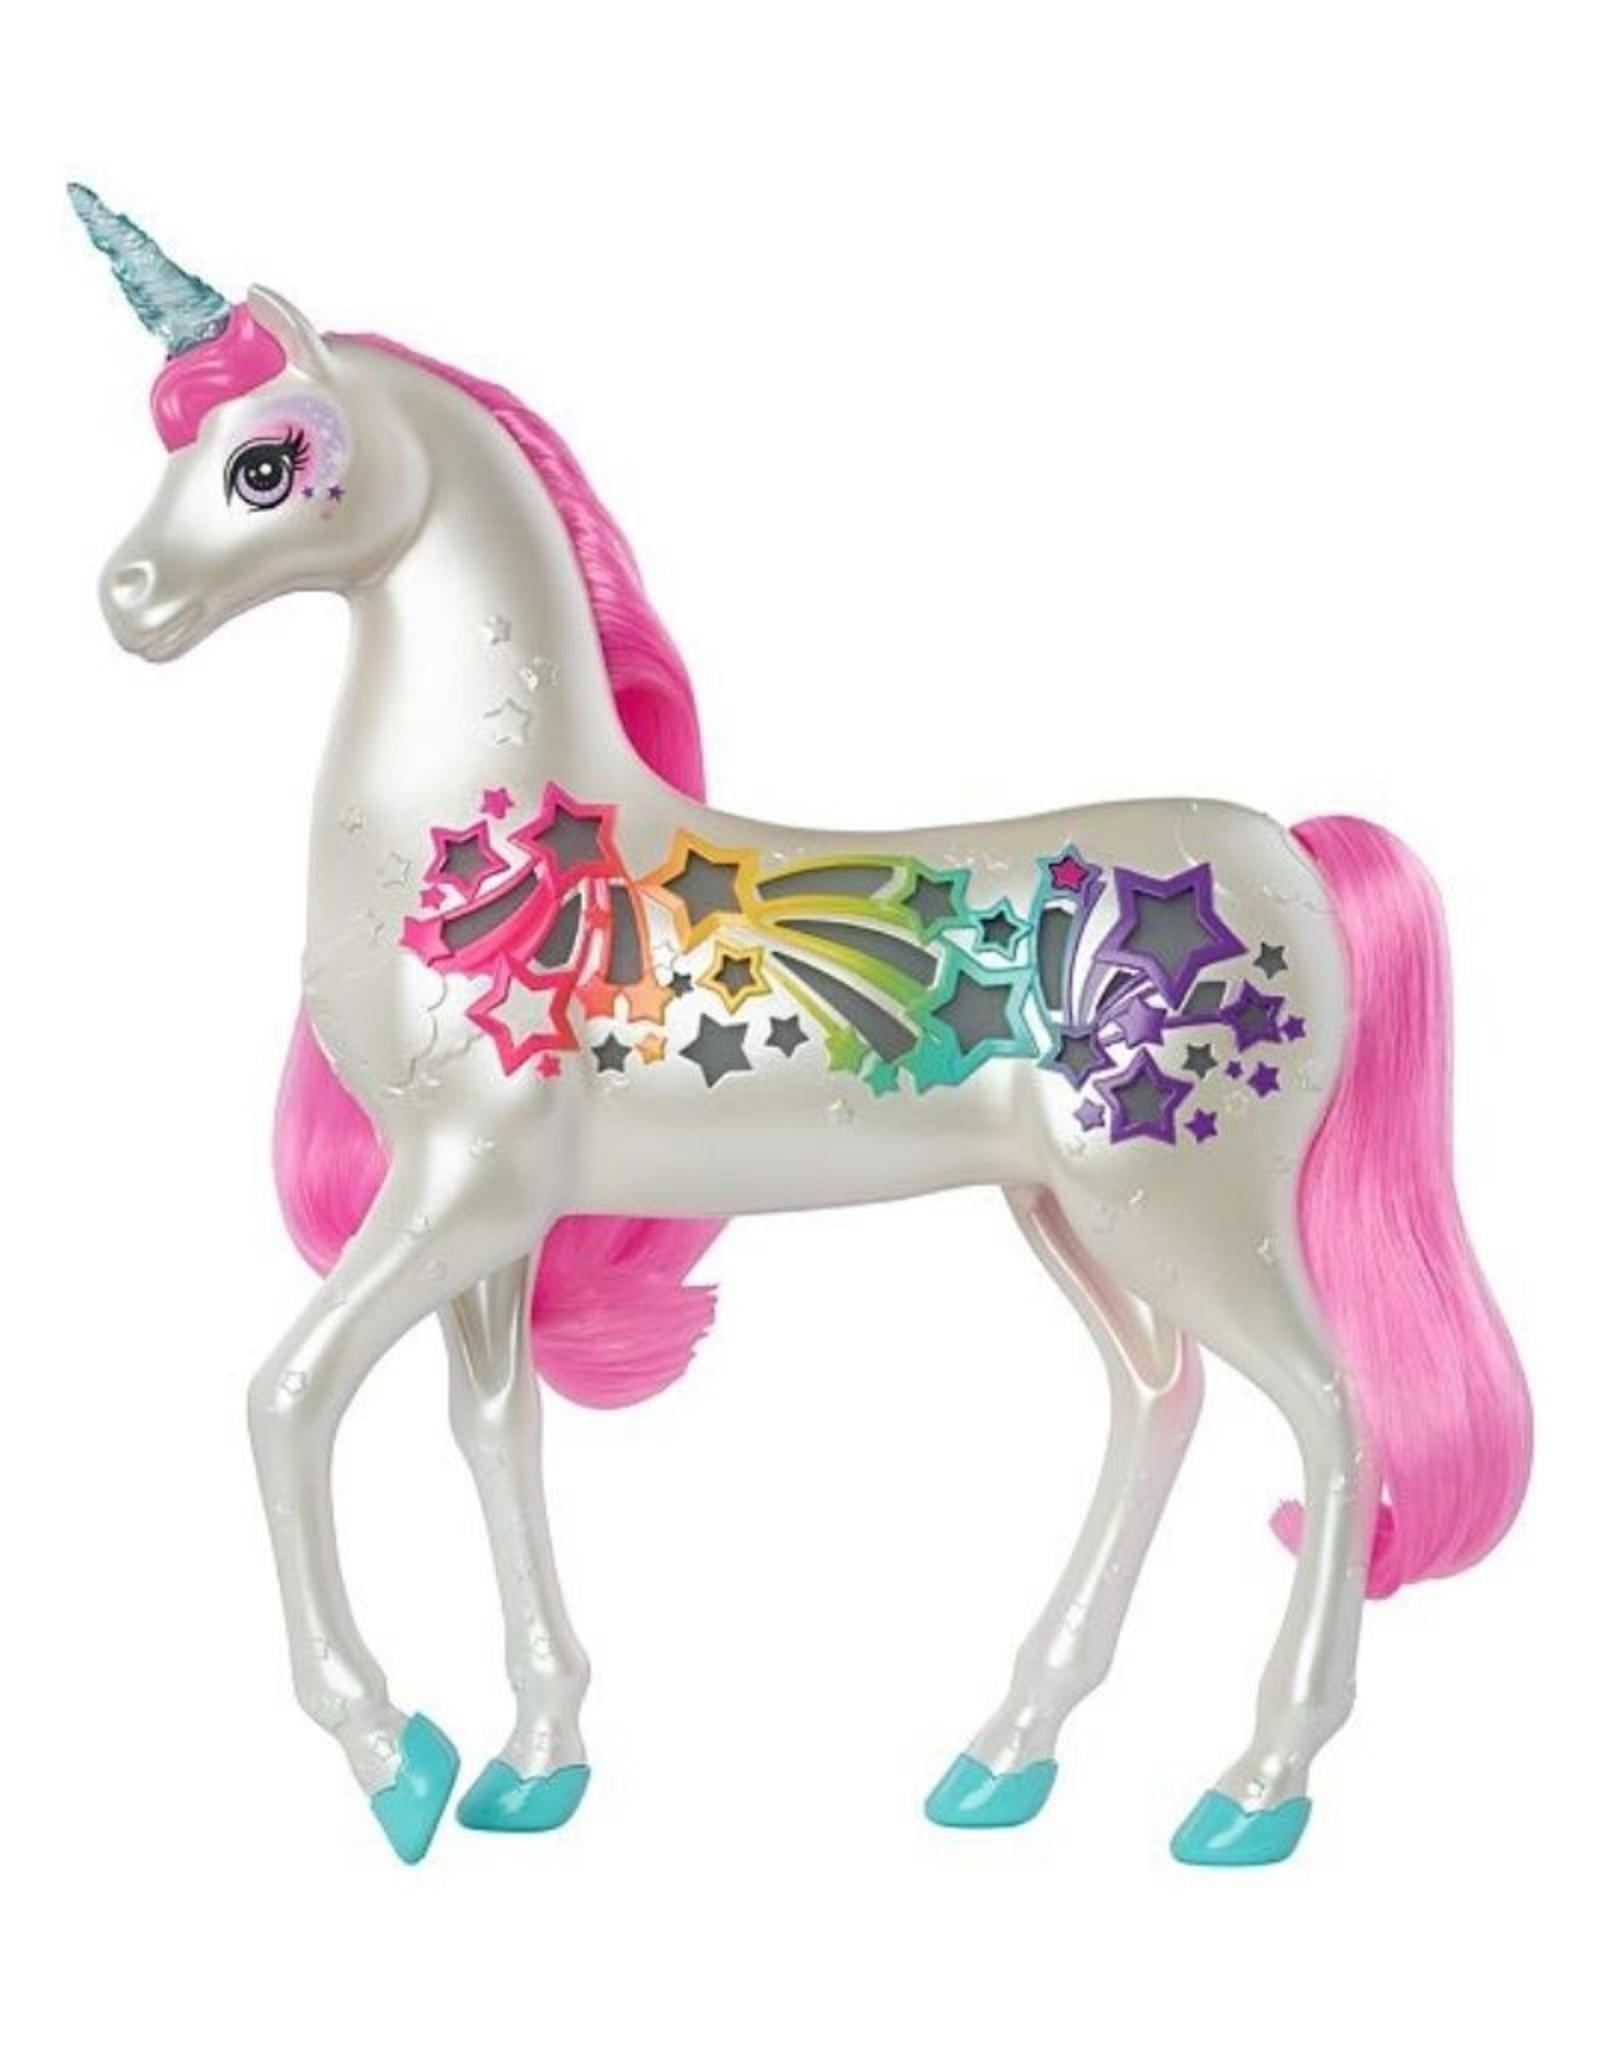 Mattel Barbie Dreamtopia Unicorn